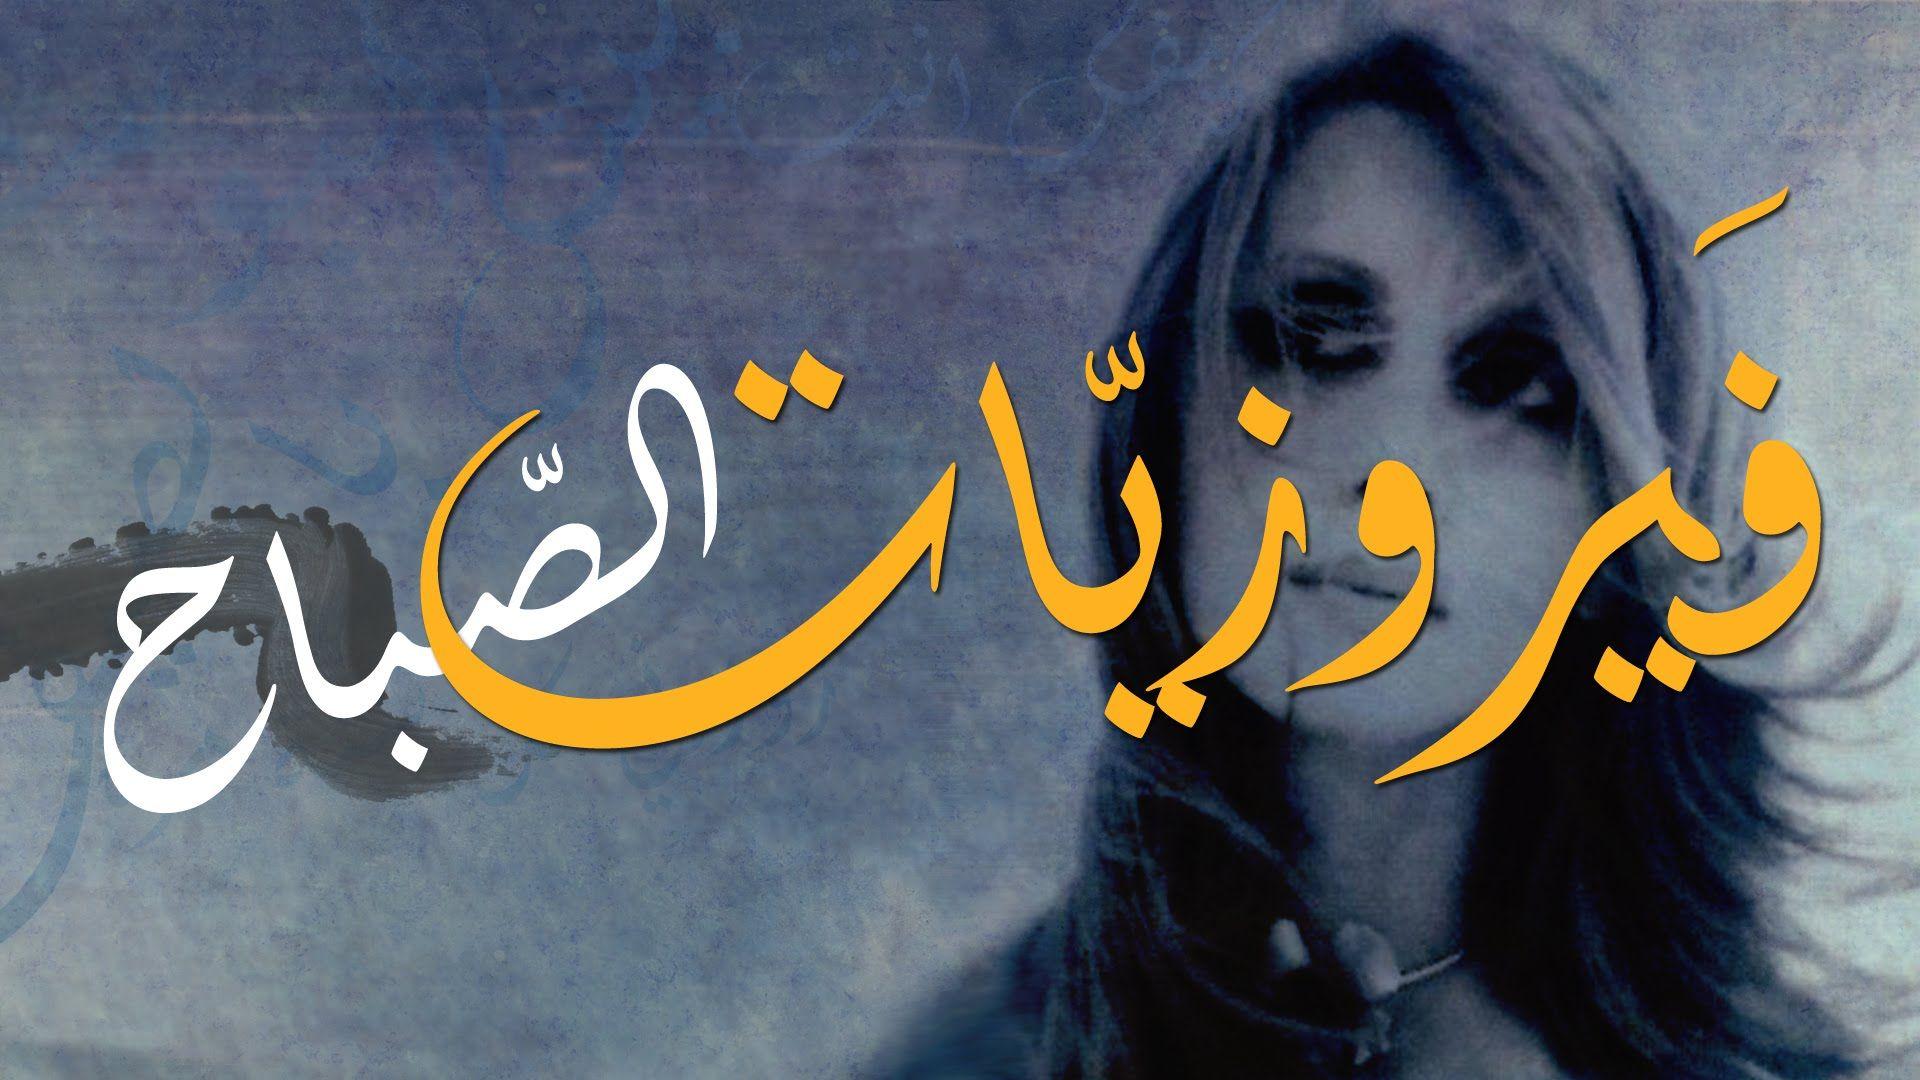 فيروز فيروزيات الصباح اروع اغاني ارزة لبنان The Best Of Fairuz Beautiful Morning Music Clips Soul Music